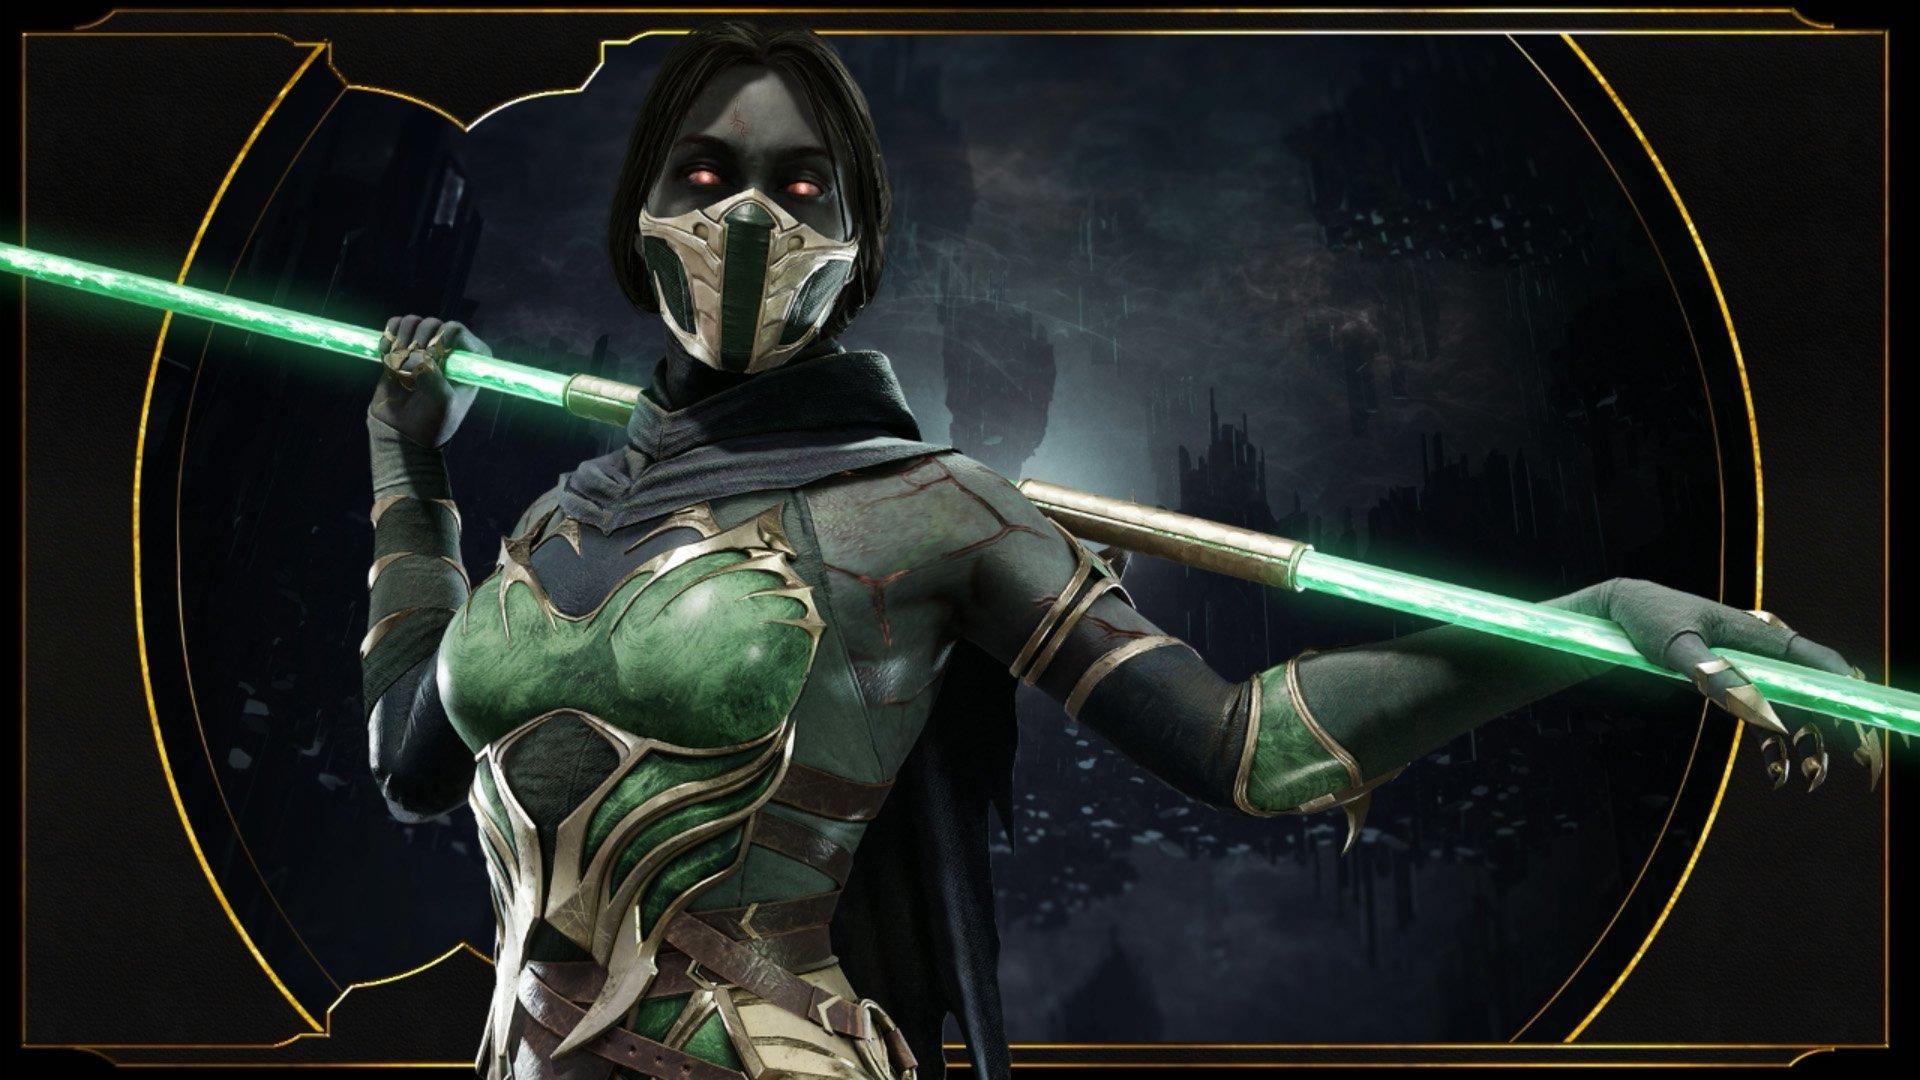 How to fix Mortal Kombat 11 crashing at launch on PC | Shacknews